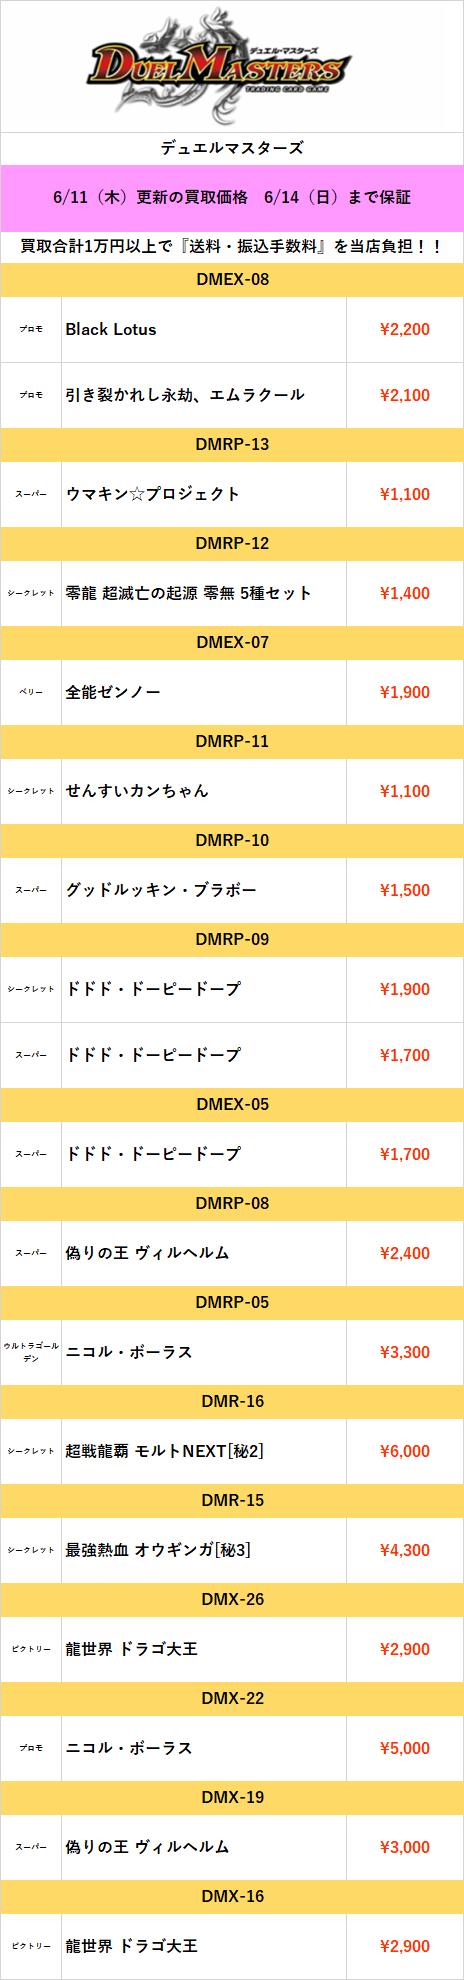 Dm_20200611160501